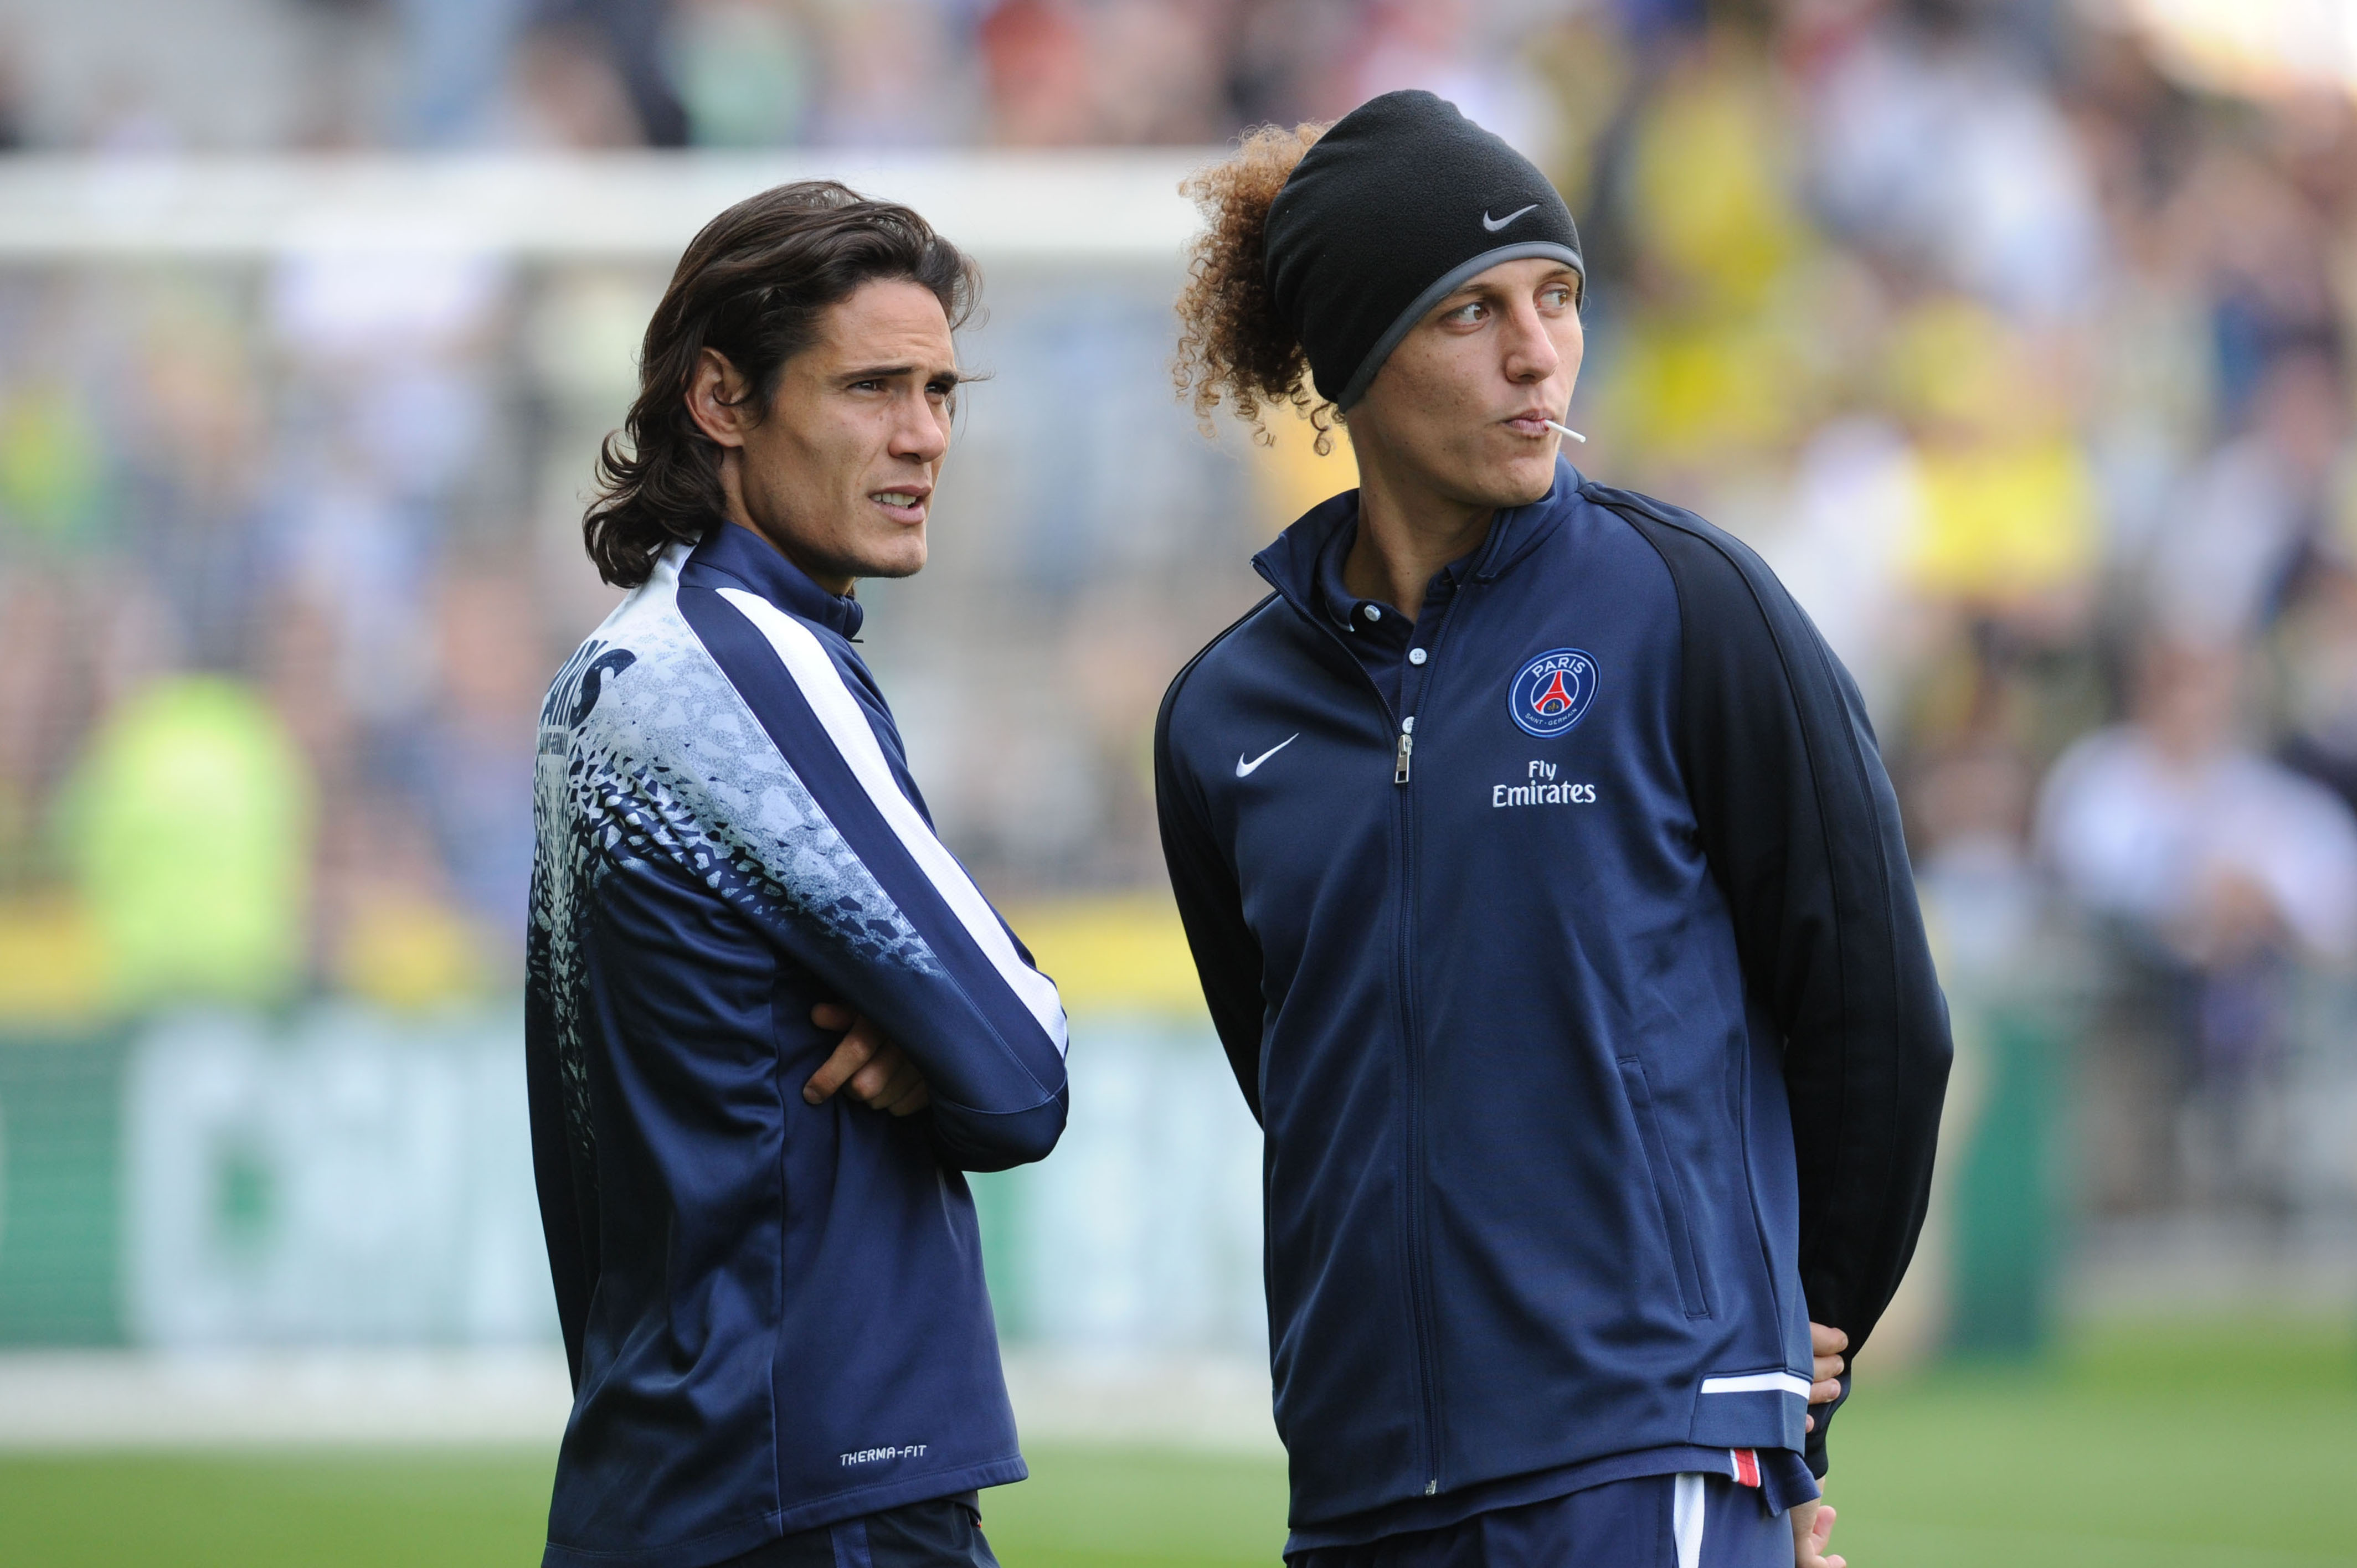 David Luiz & Edinson Cavani Fear Return to PSG After Attacks